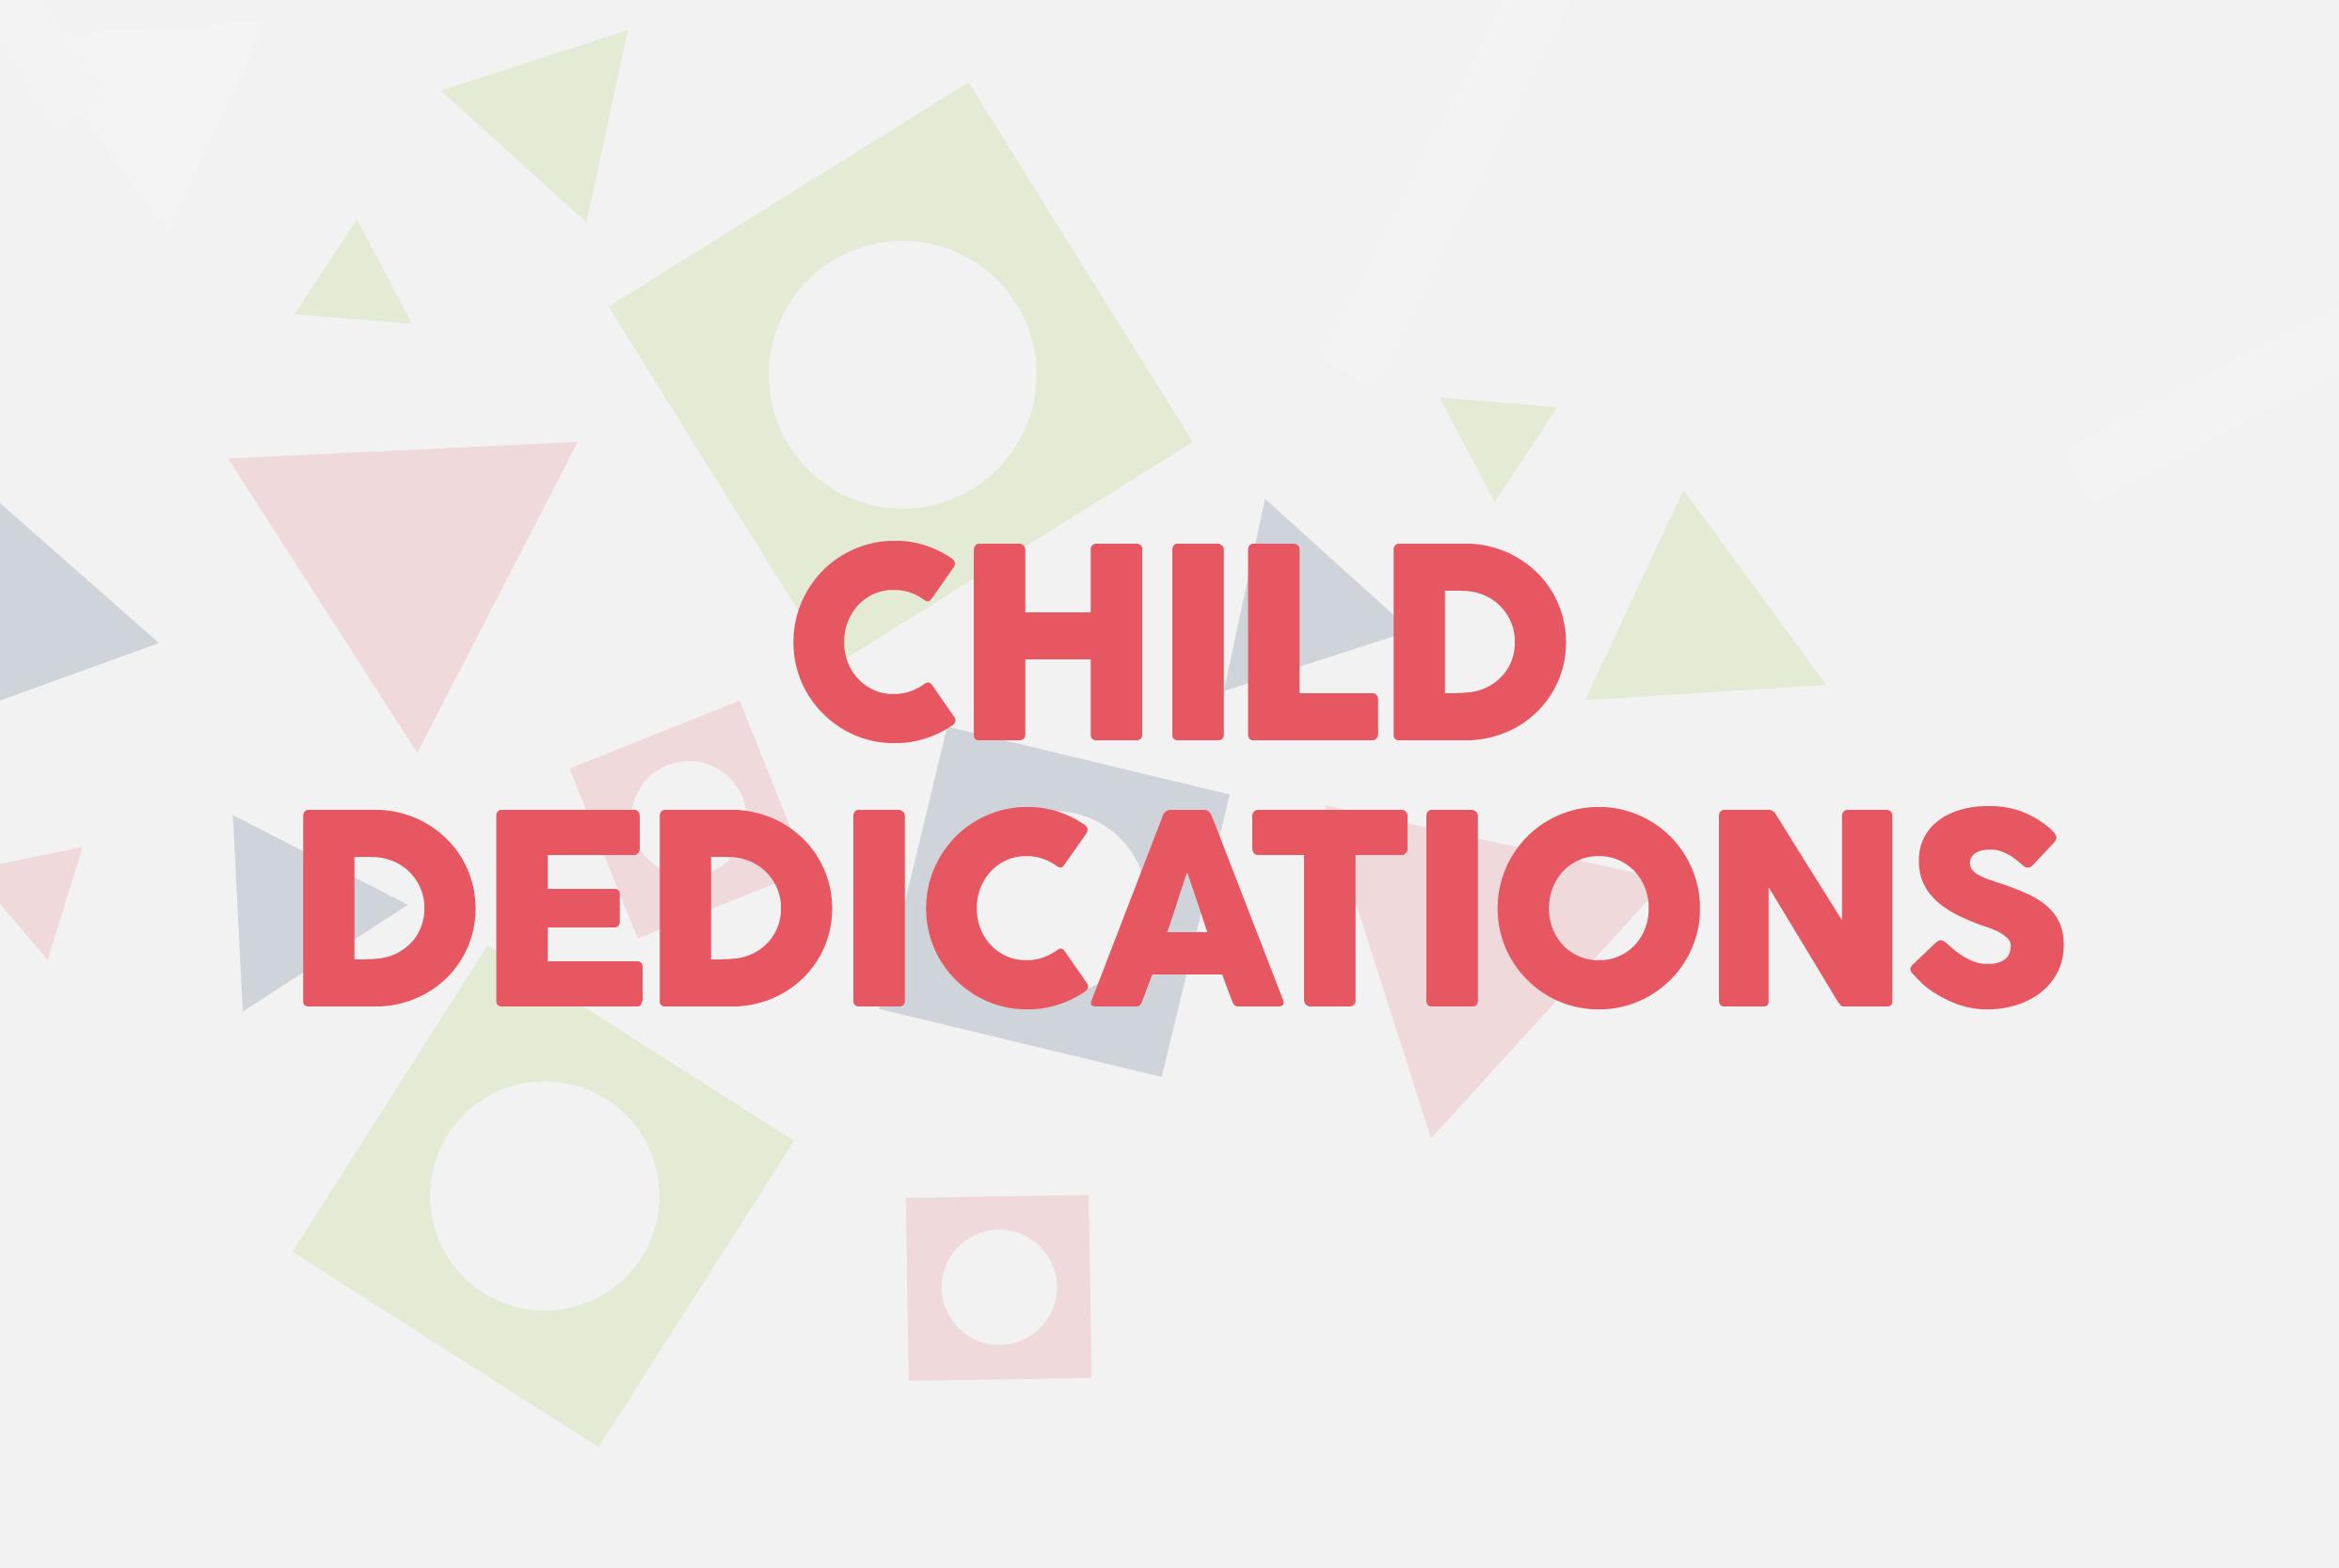 Child dedications mailchimp